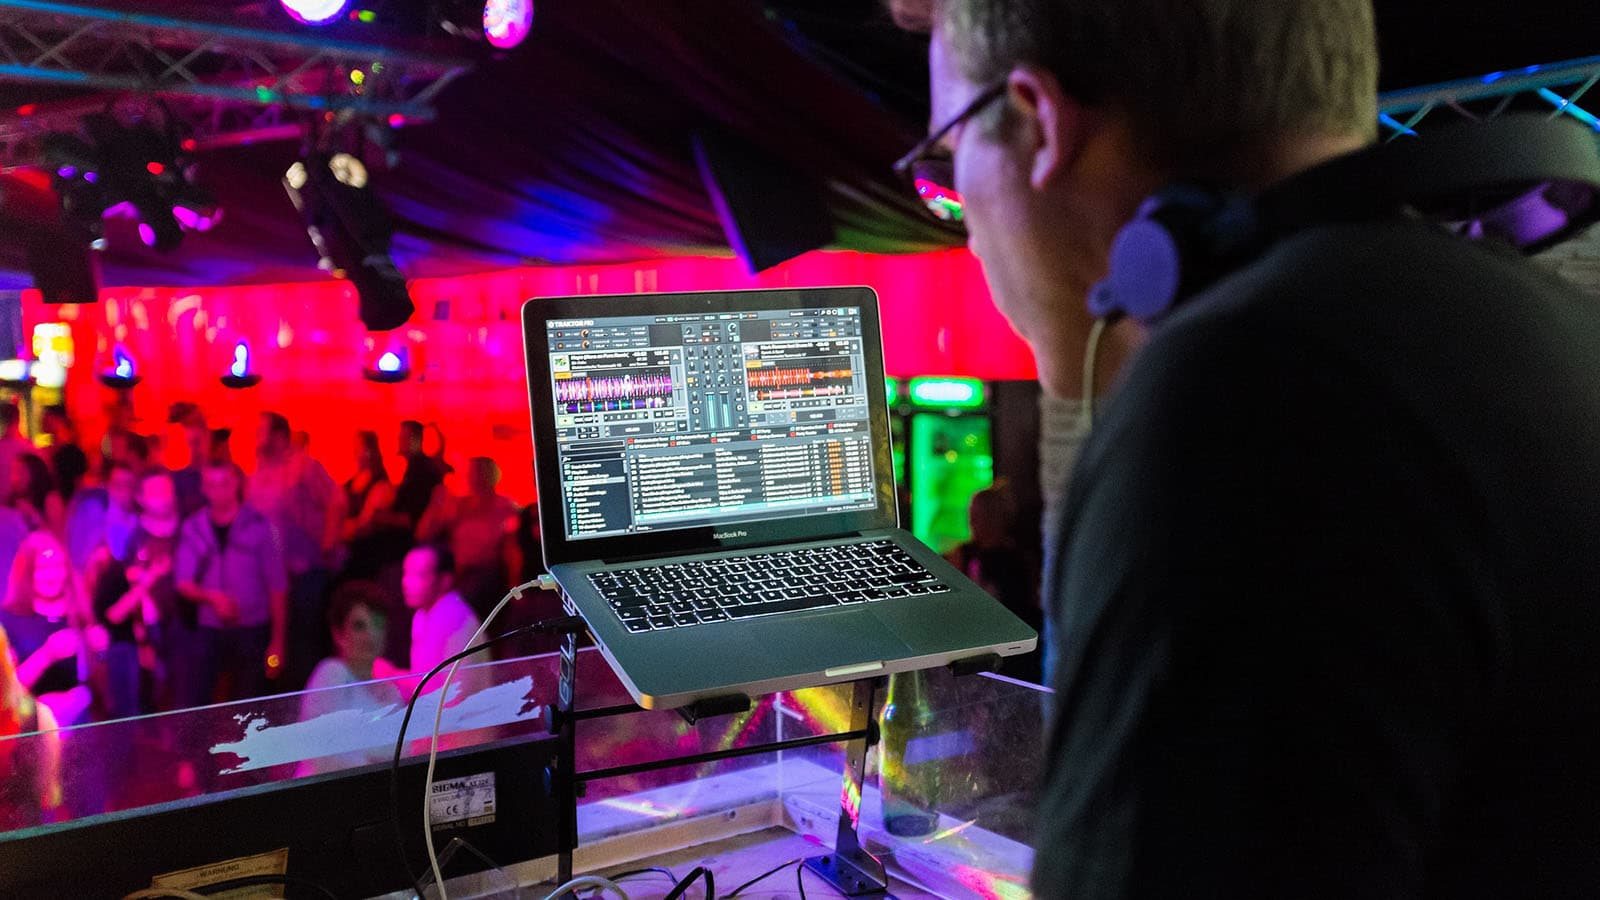 ausgehen-vendee-diskotheken-salon-bars